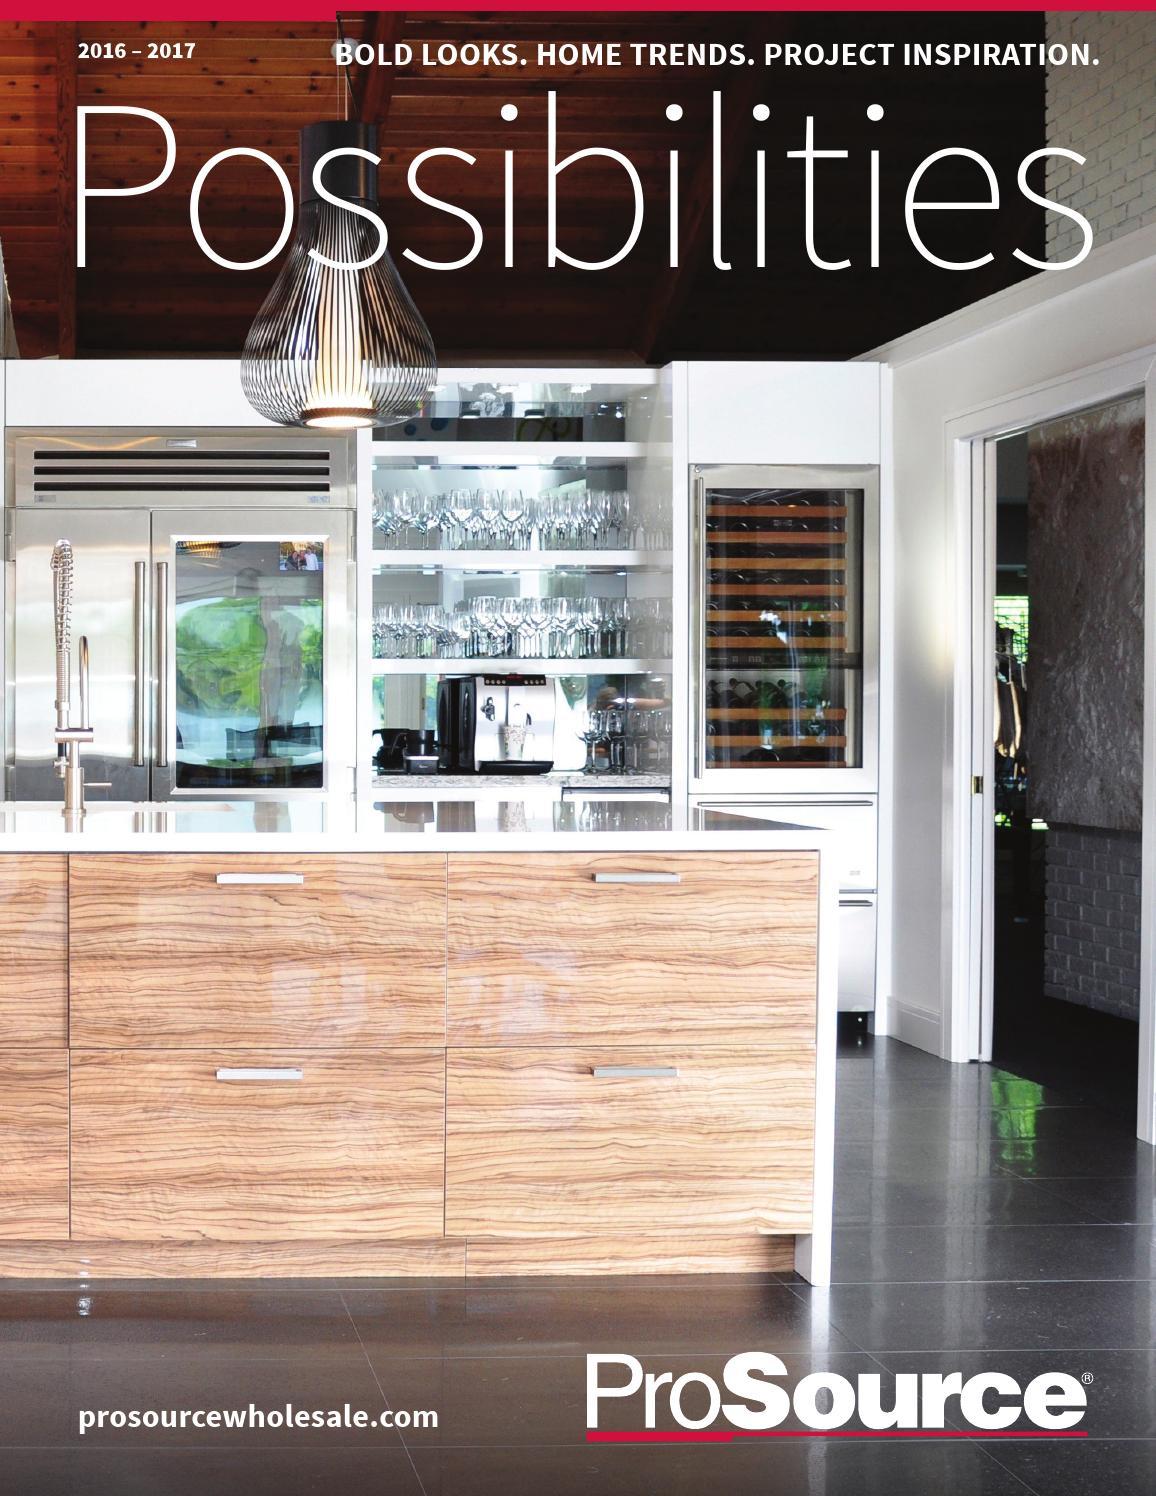 2016 2017 Home Improvement Prosource Wholesale Catalog